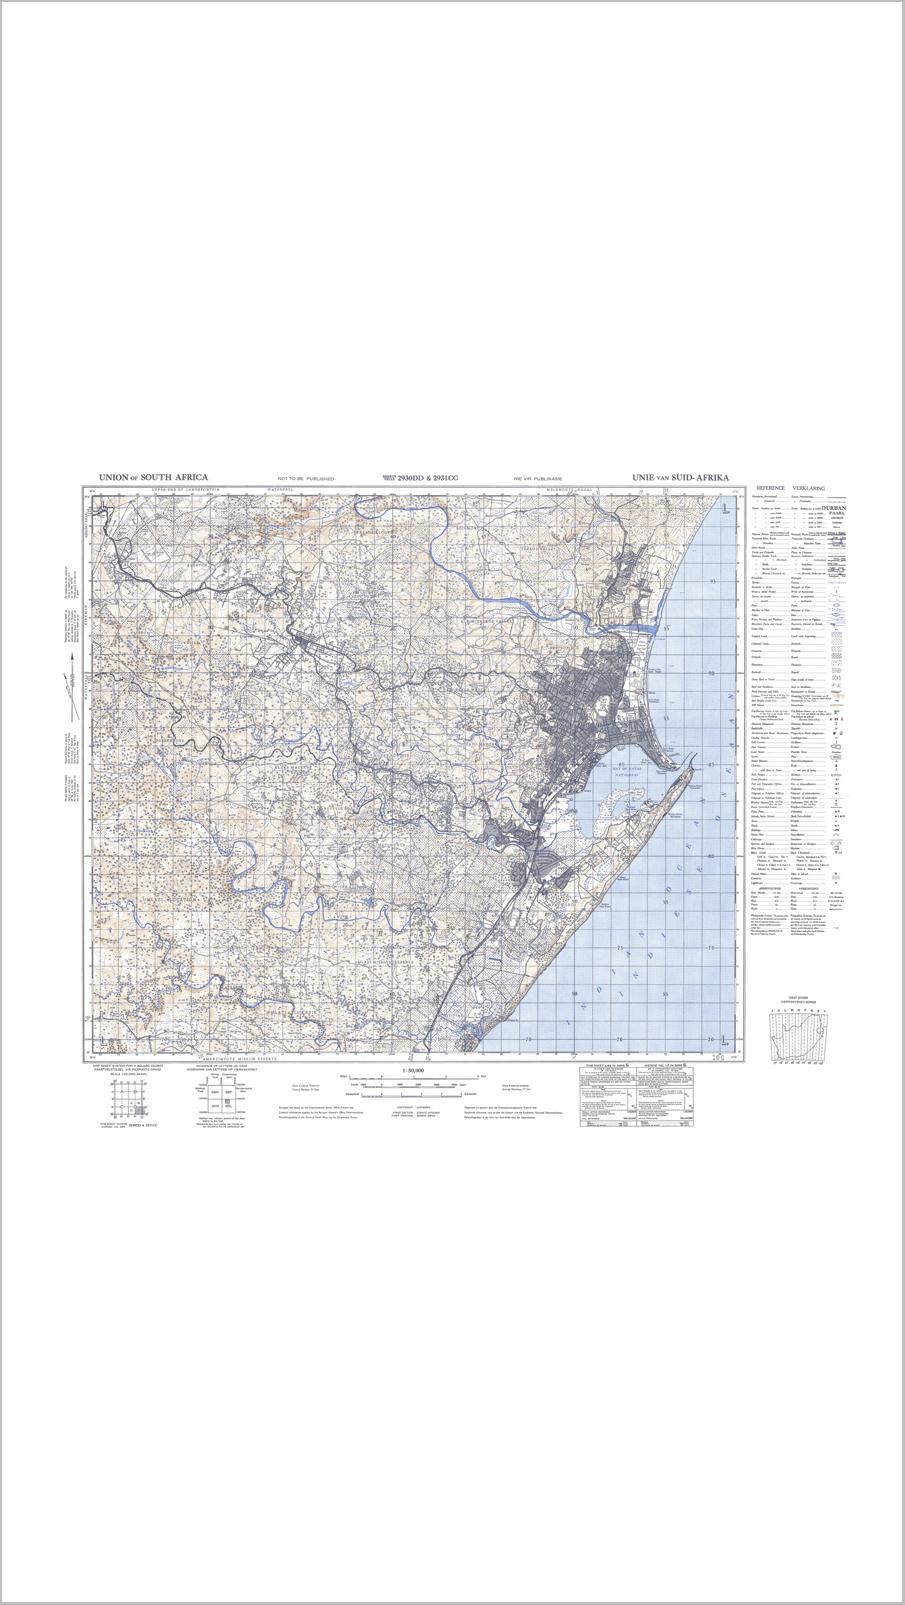 1940 Durban Vintage Map R99.99